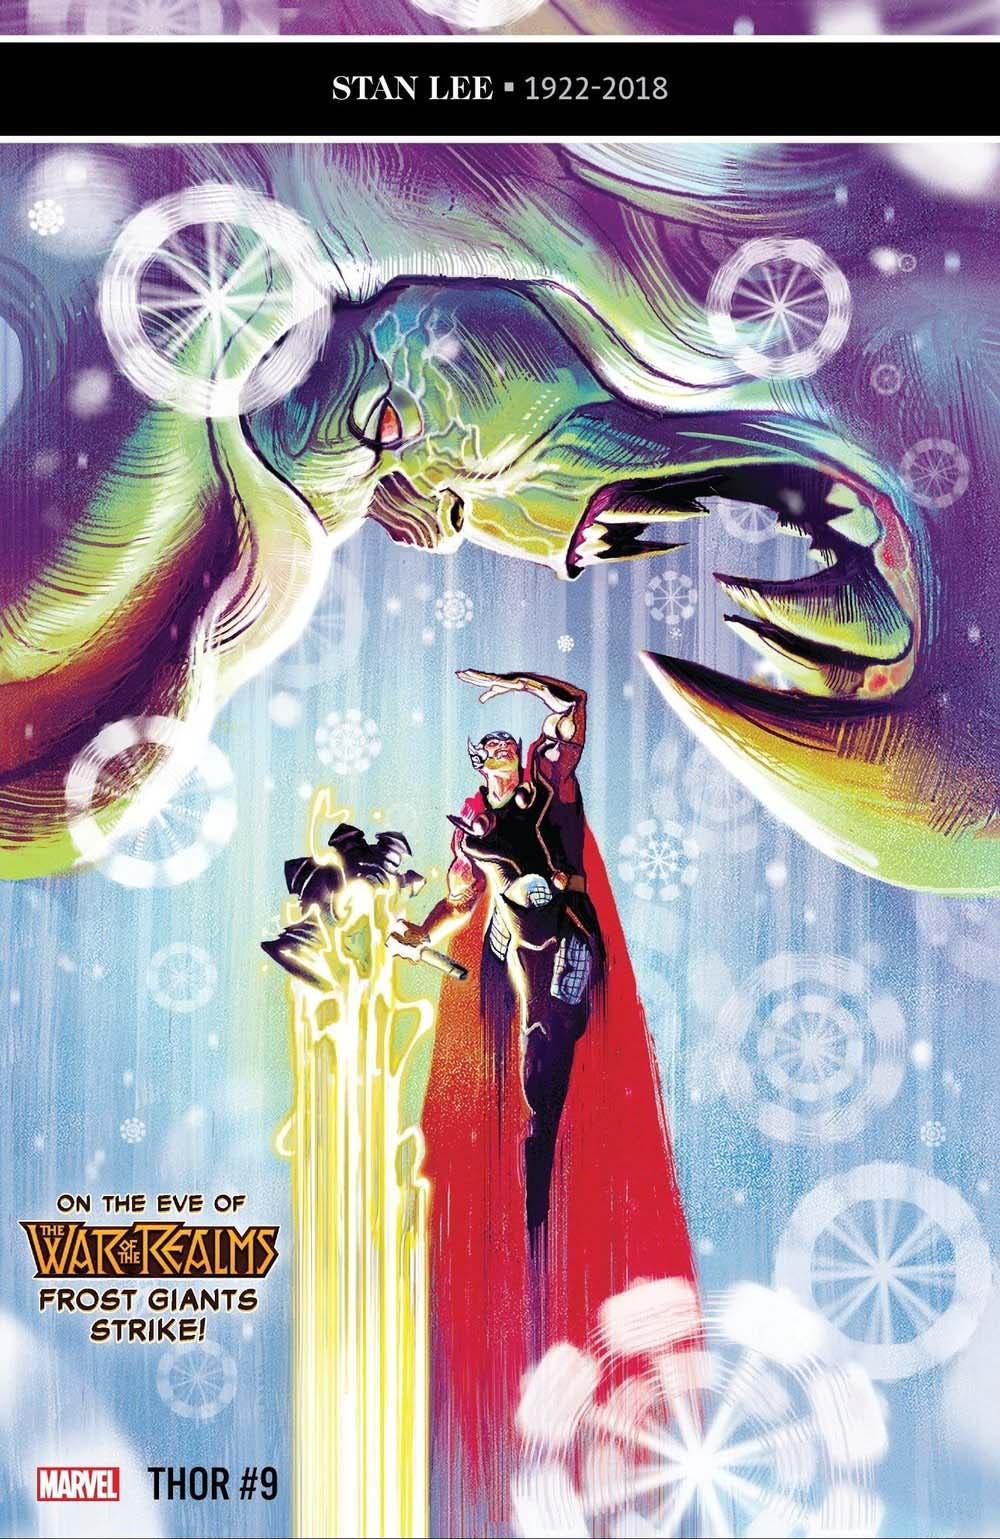 Marvel Portada THOR #8 jason Aaron